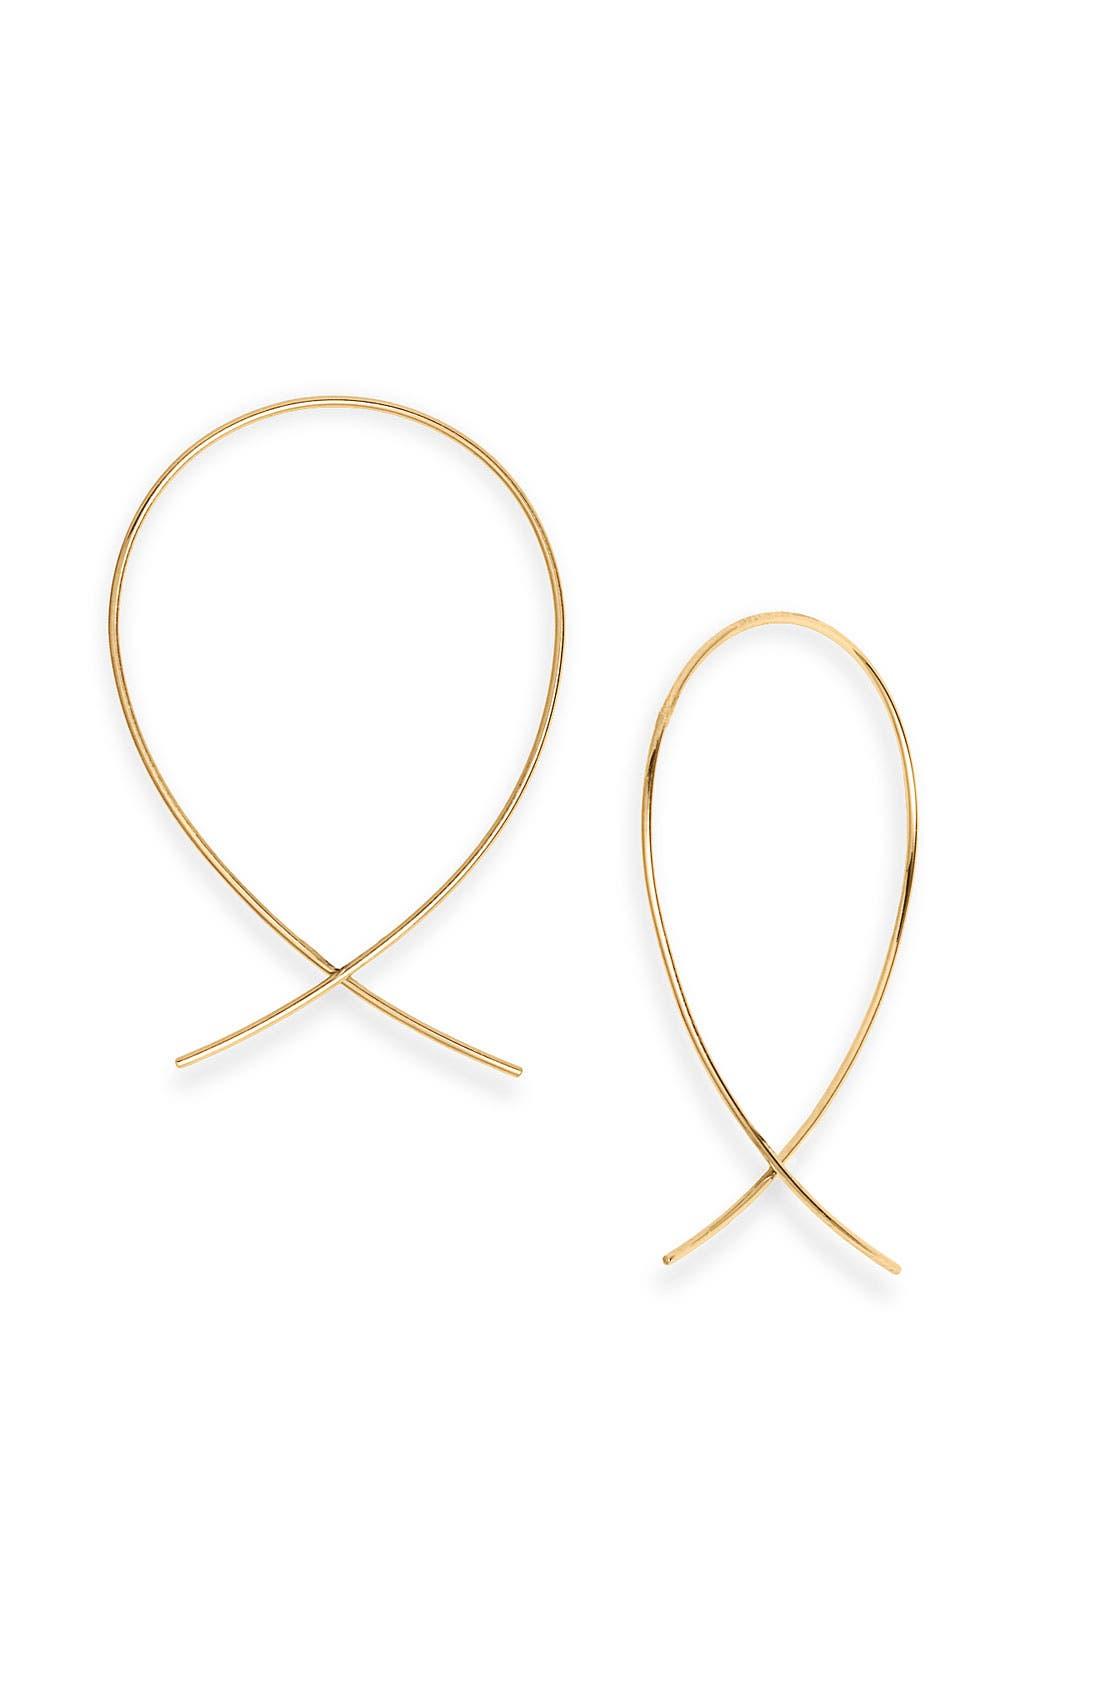 Main Image - Lana Jewelry 'Upside Down' Small Hoop Earrings